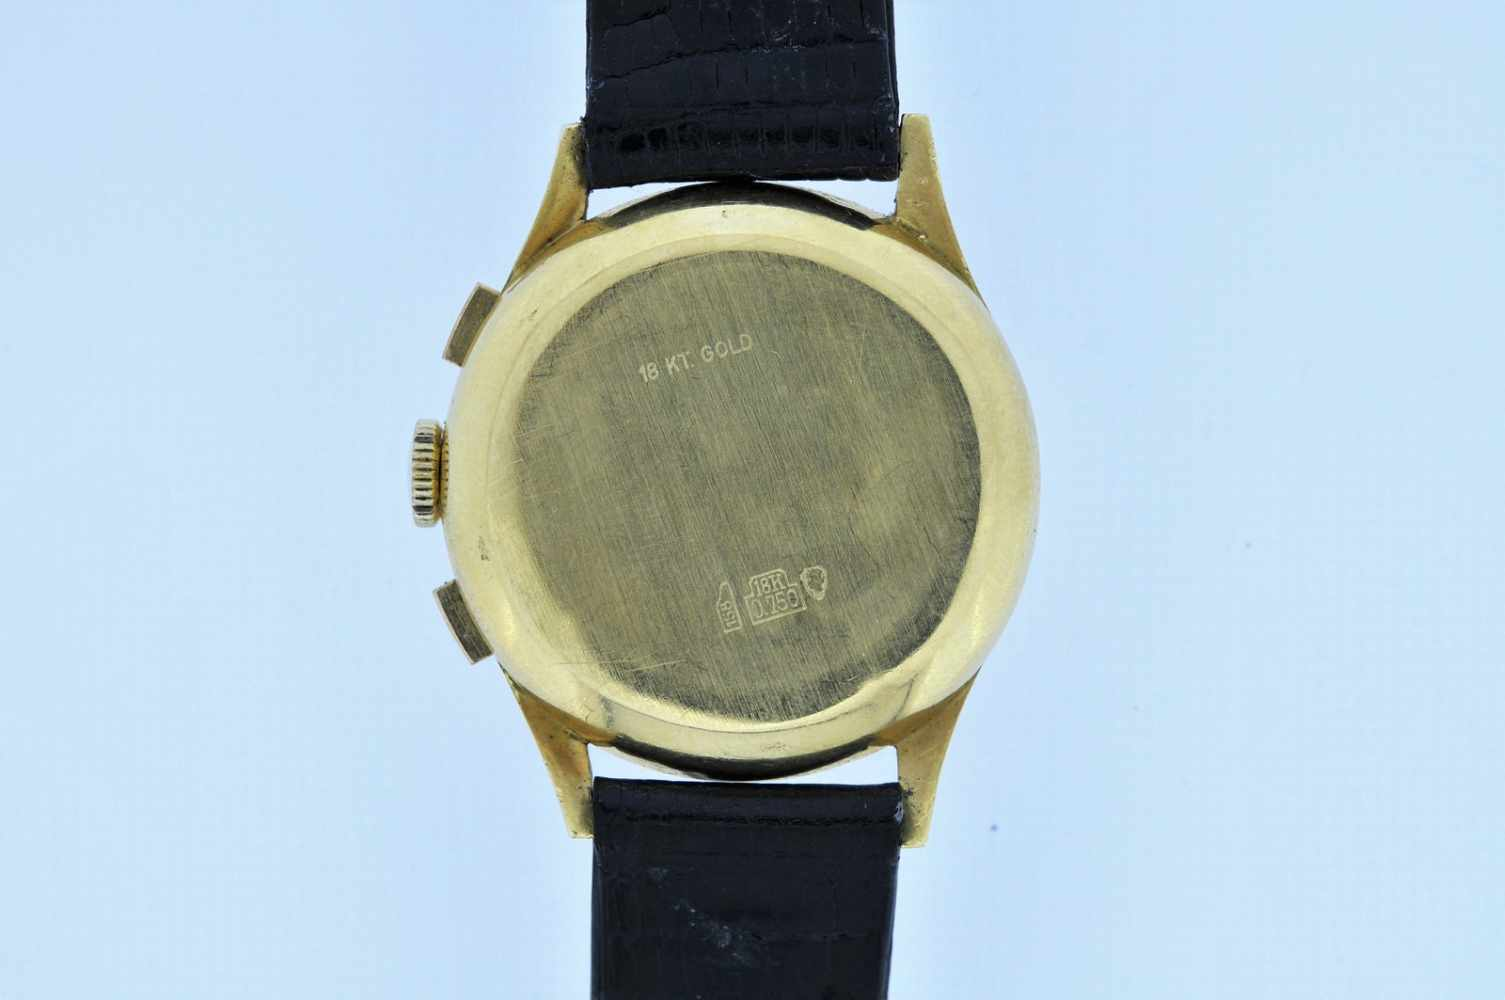 Gigandet Goldene 18karätige Armbanduhr an Lederband, Gigandet Wakmann, Chronograph, Stoppfunktion, - Bild 4 aus 5